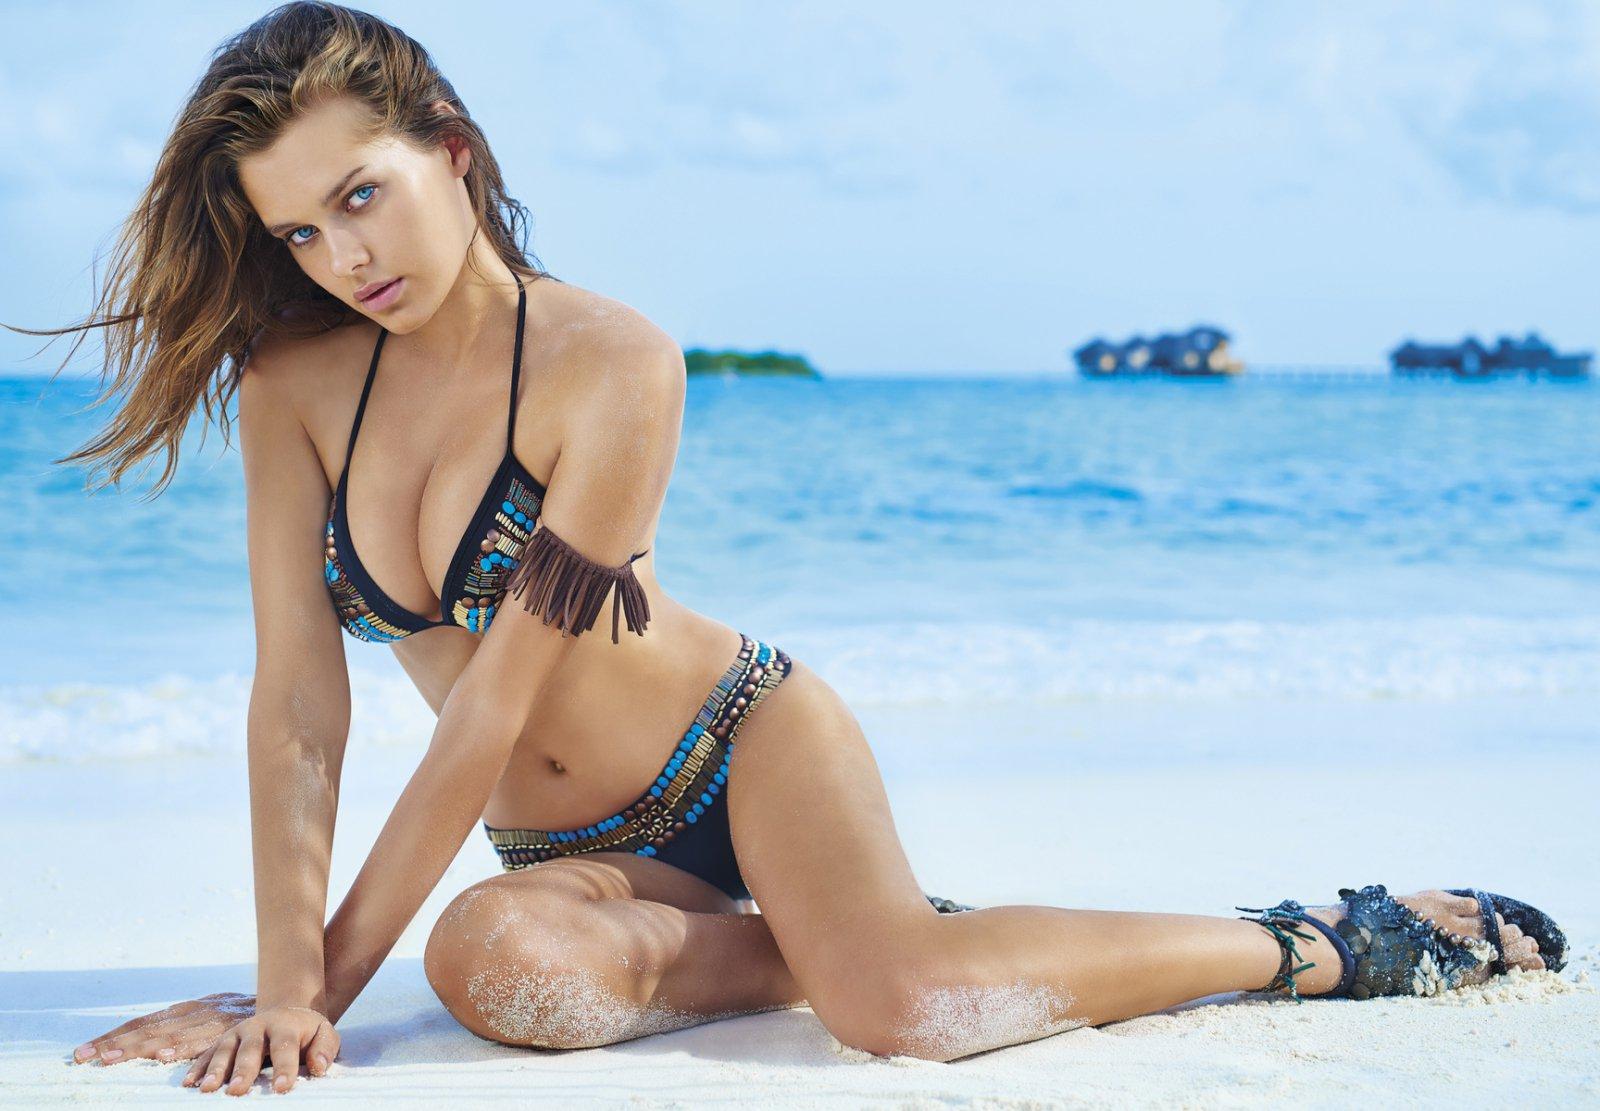 Solveig Mork Hansen nude (22 photos) Sideboobs, Snapchat, swimsuit